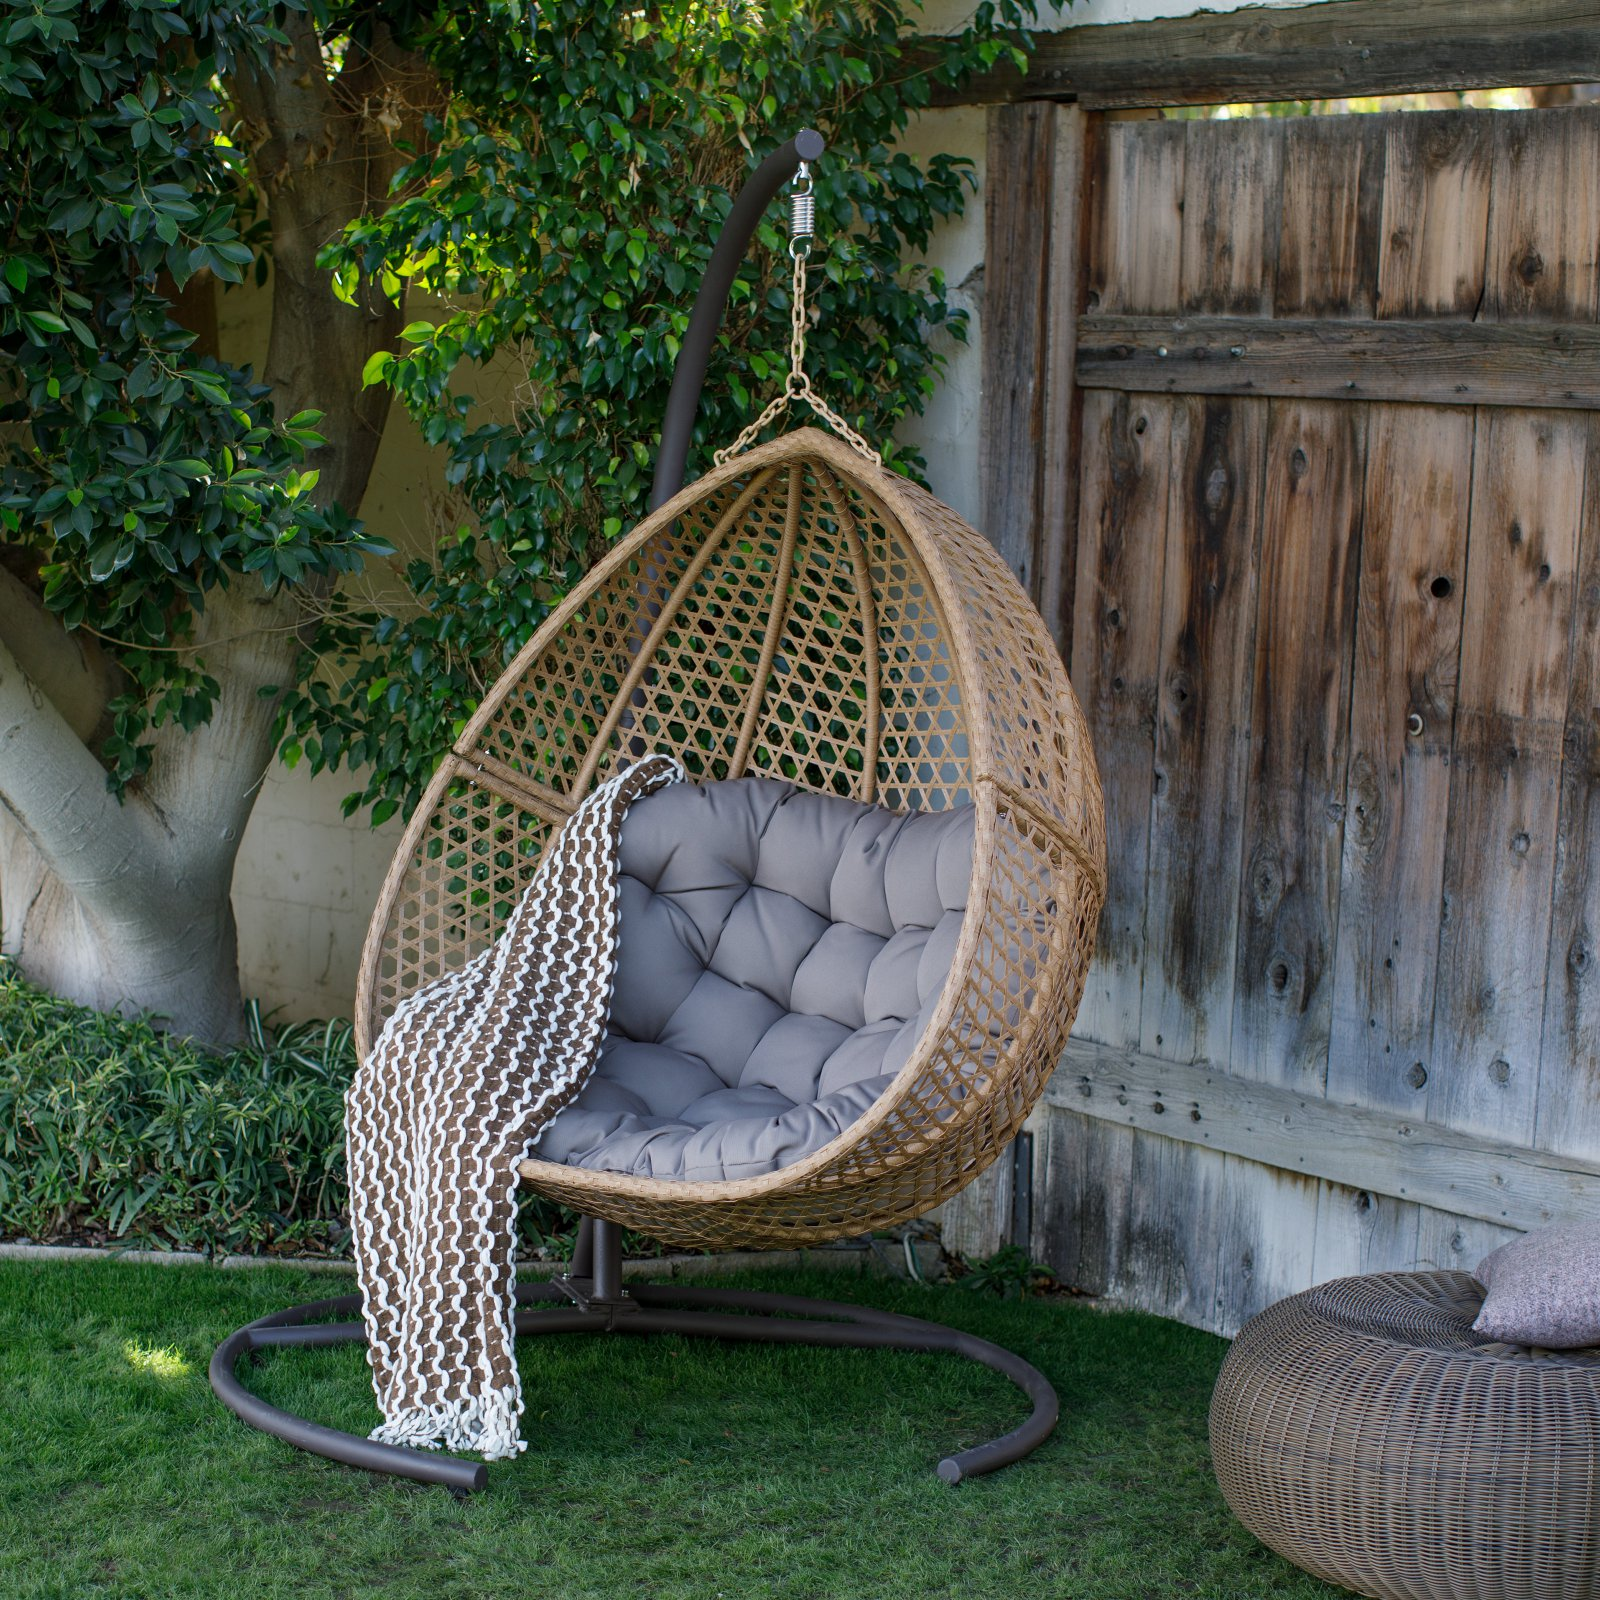 Belham Living Cayman Resin Wicker Hanging Double Egg Chair